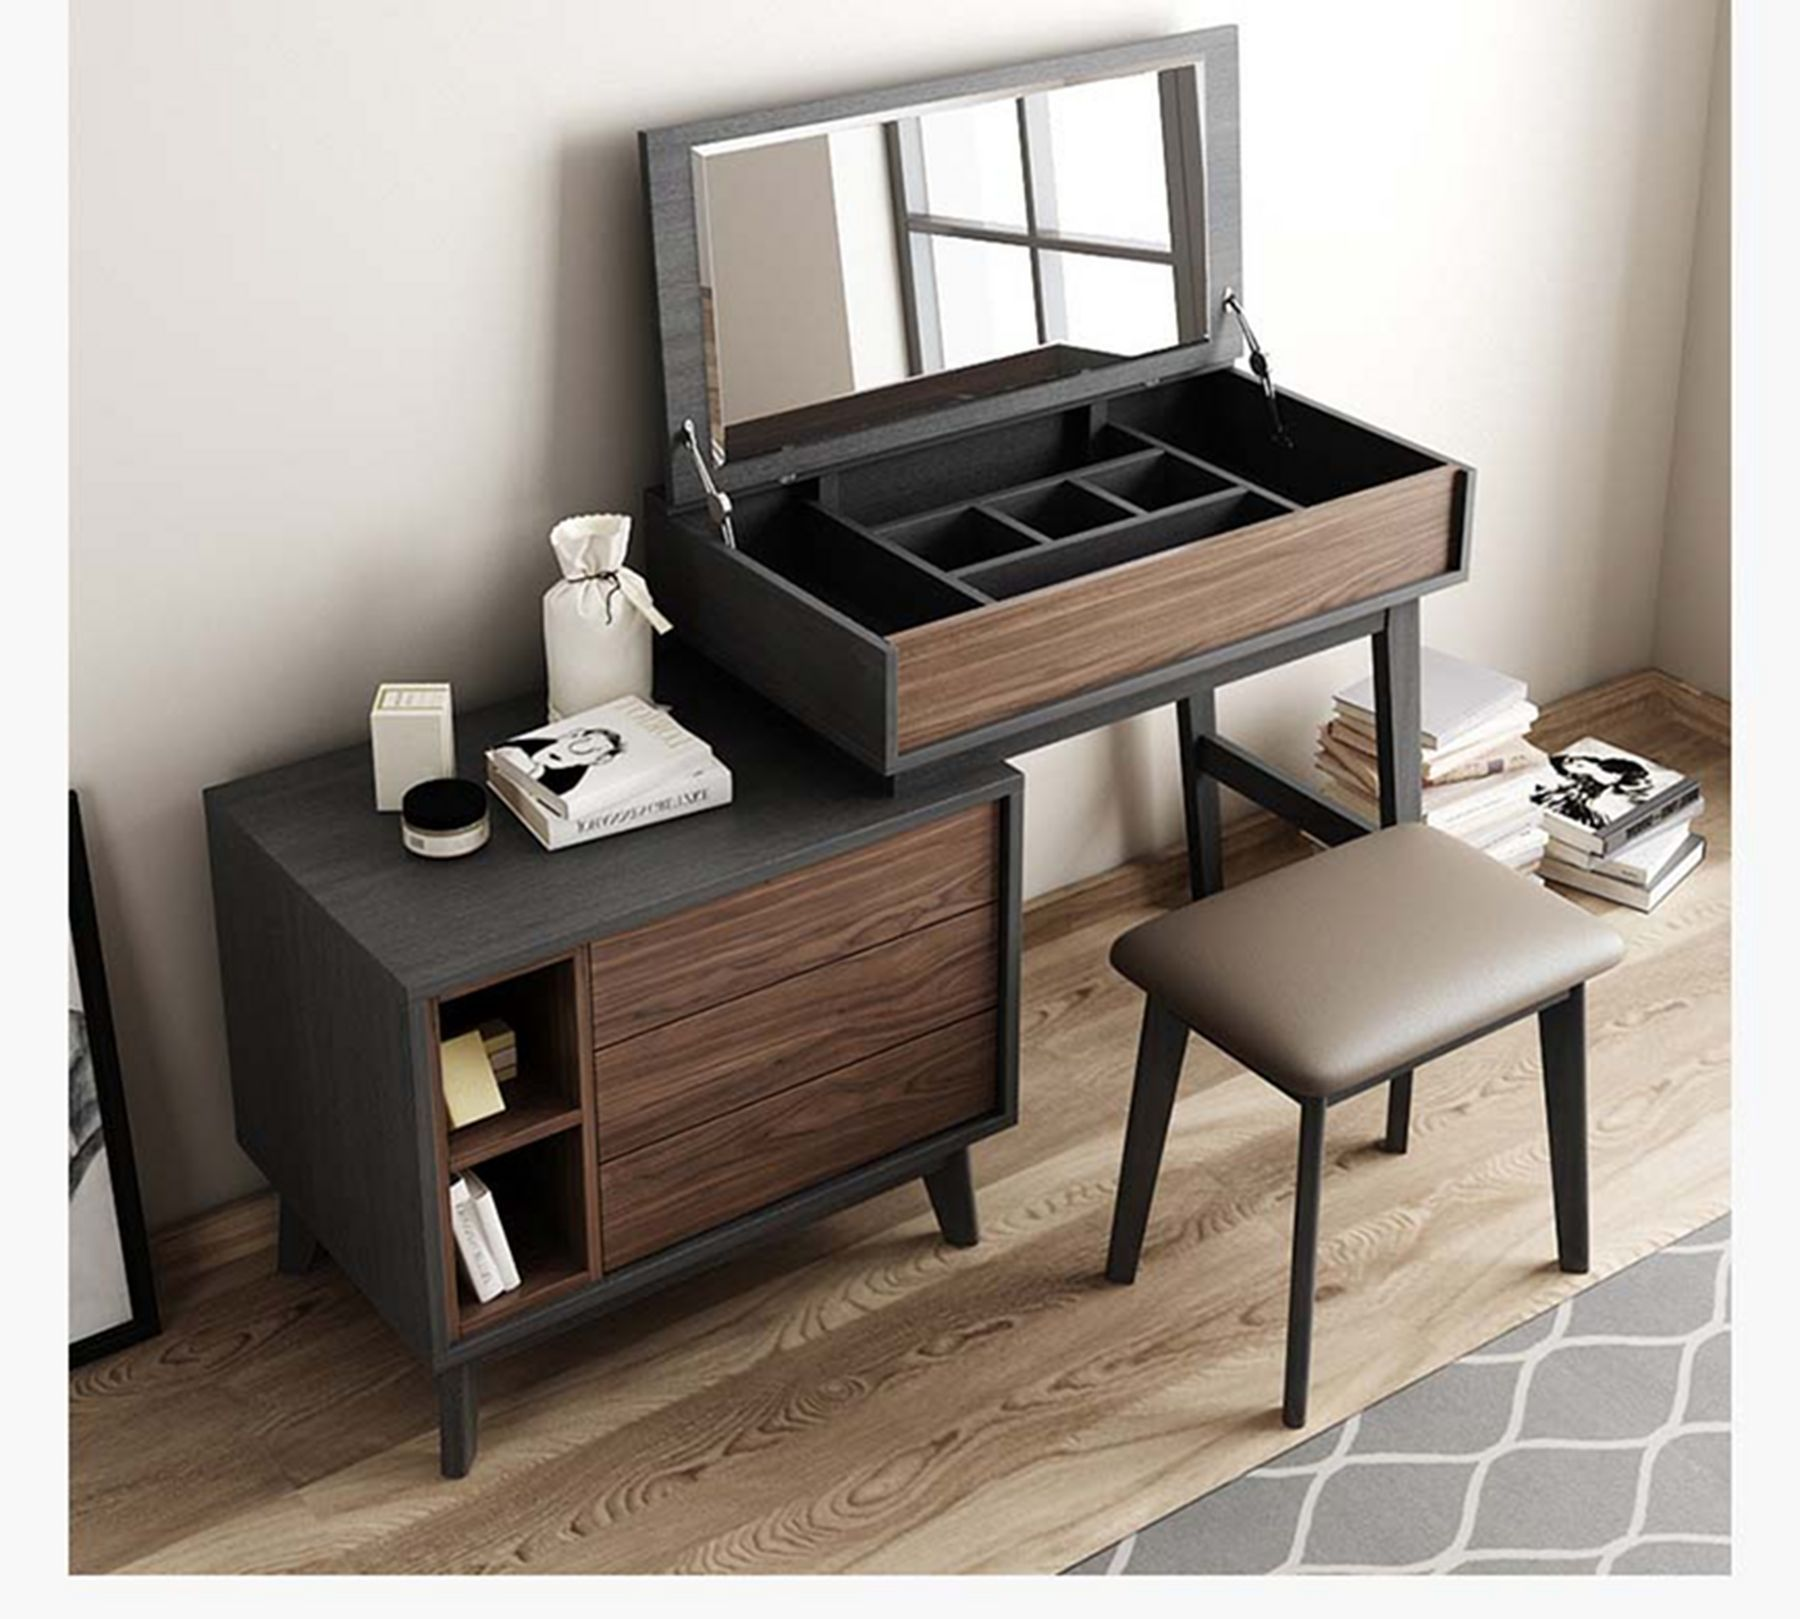 Wooden Dressing Table Design Minimalist Dressing Tables Small Dressing Table Dressing Table Design